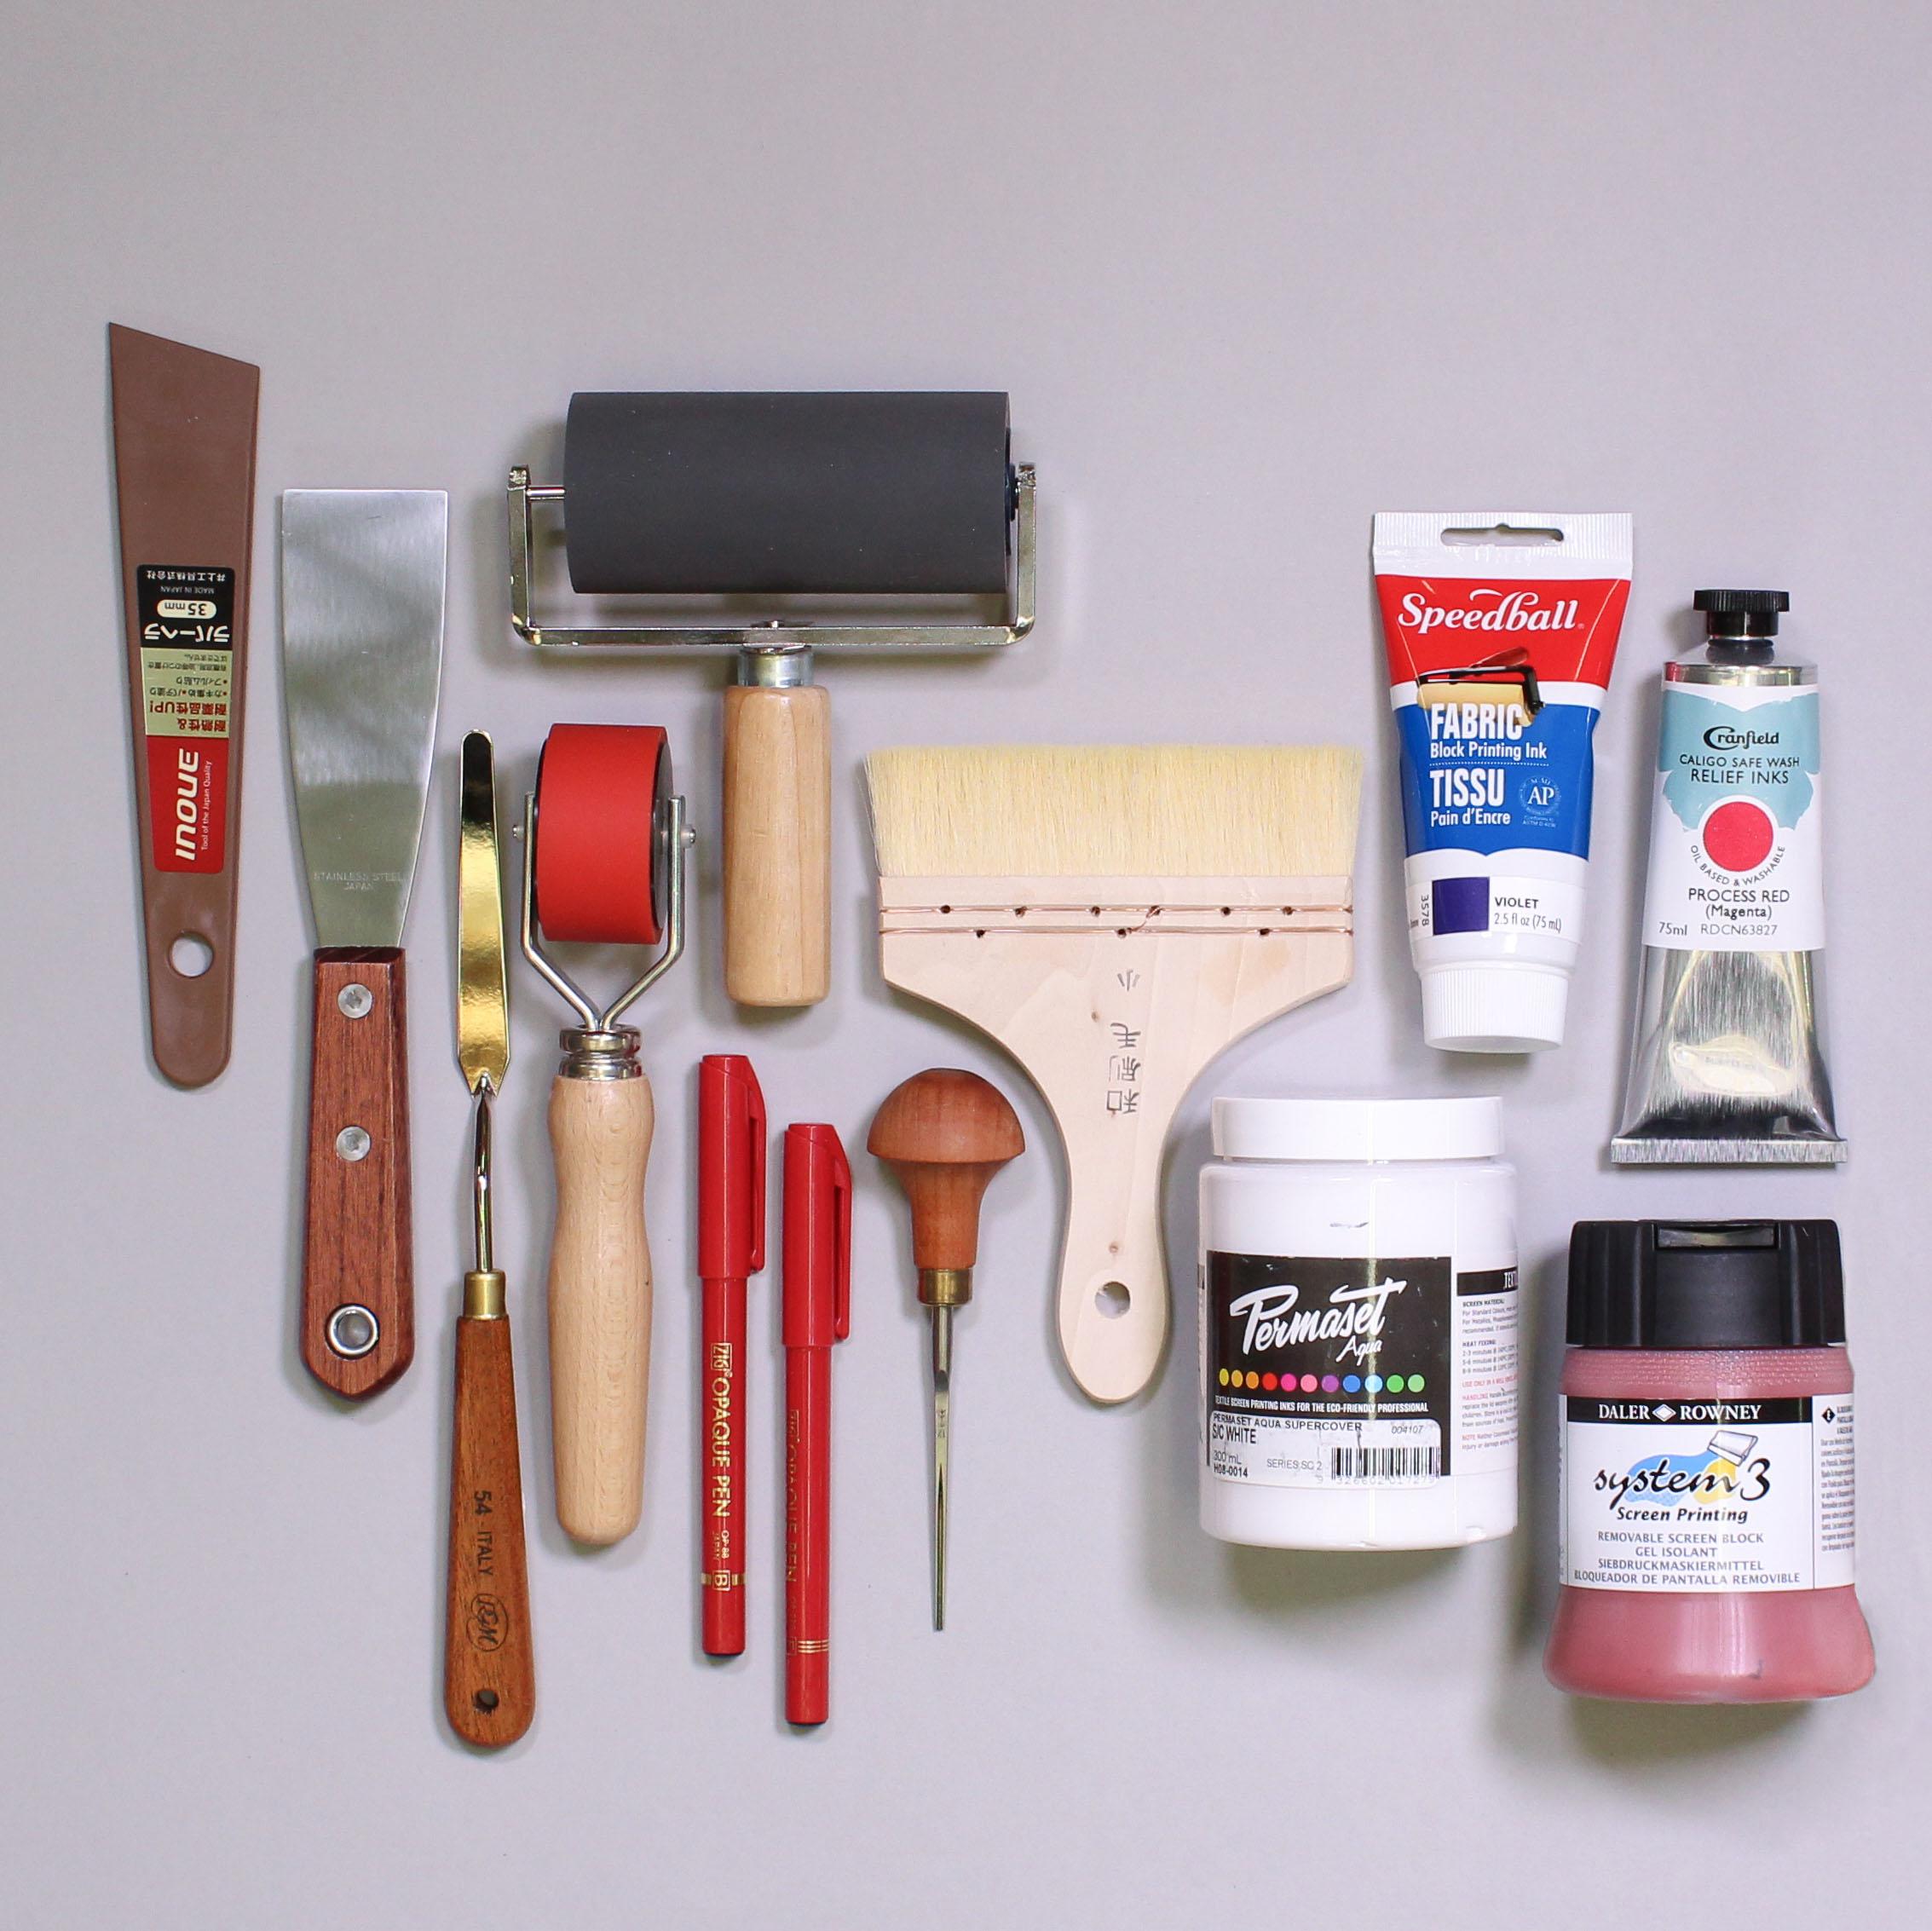 supplies-from-handprinted-ltd